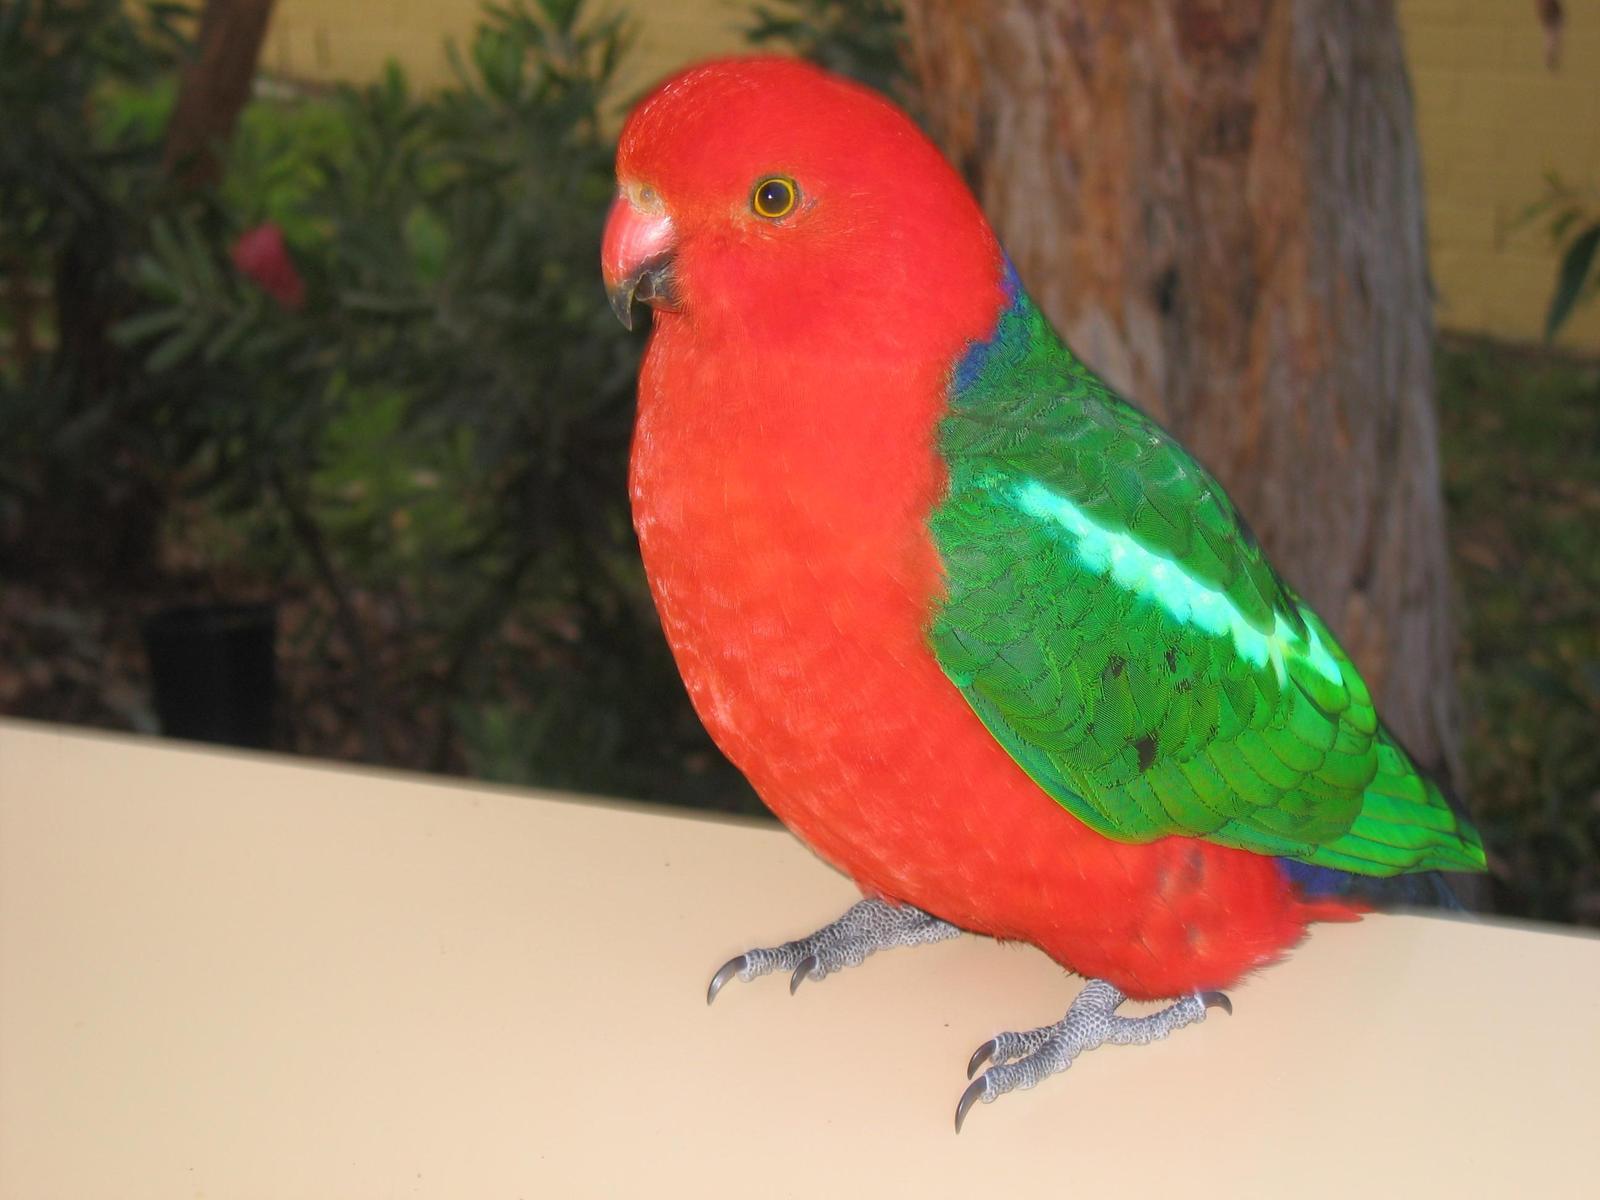 Australian King-Parrot Photo by Daliel Leite